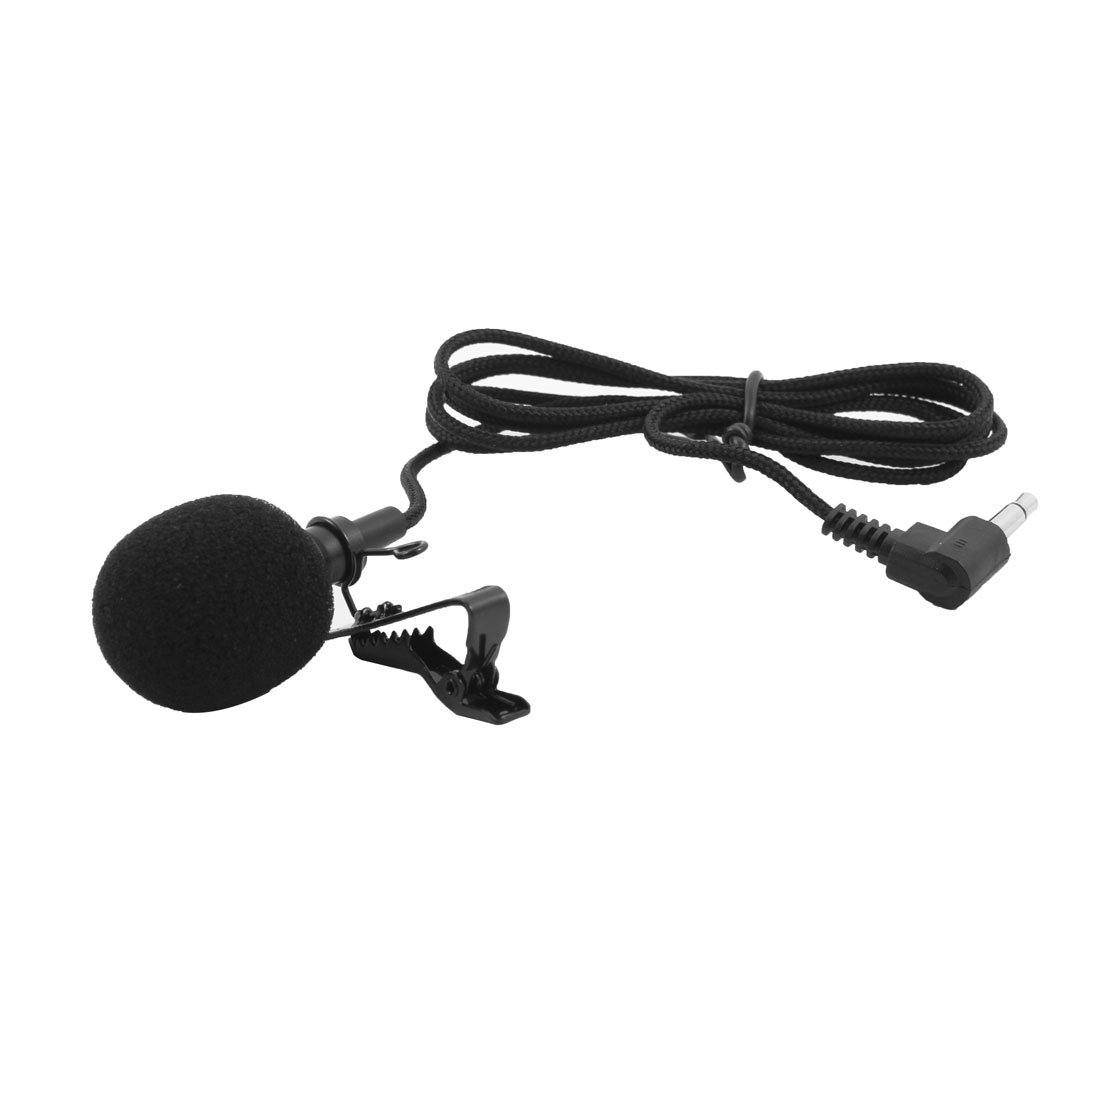 Teacher Computer 3.5mm Clip-on Condenser Earphone Lavalier Microphone 0.94M Long Black